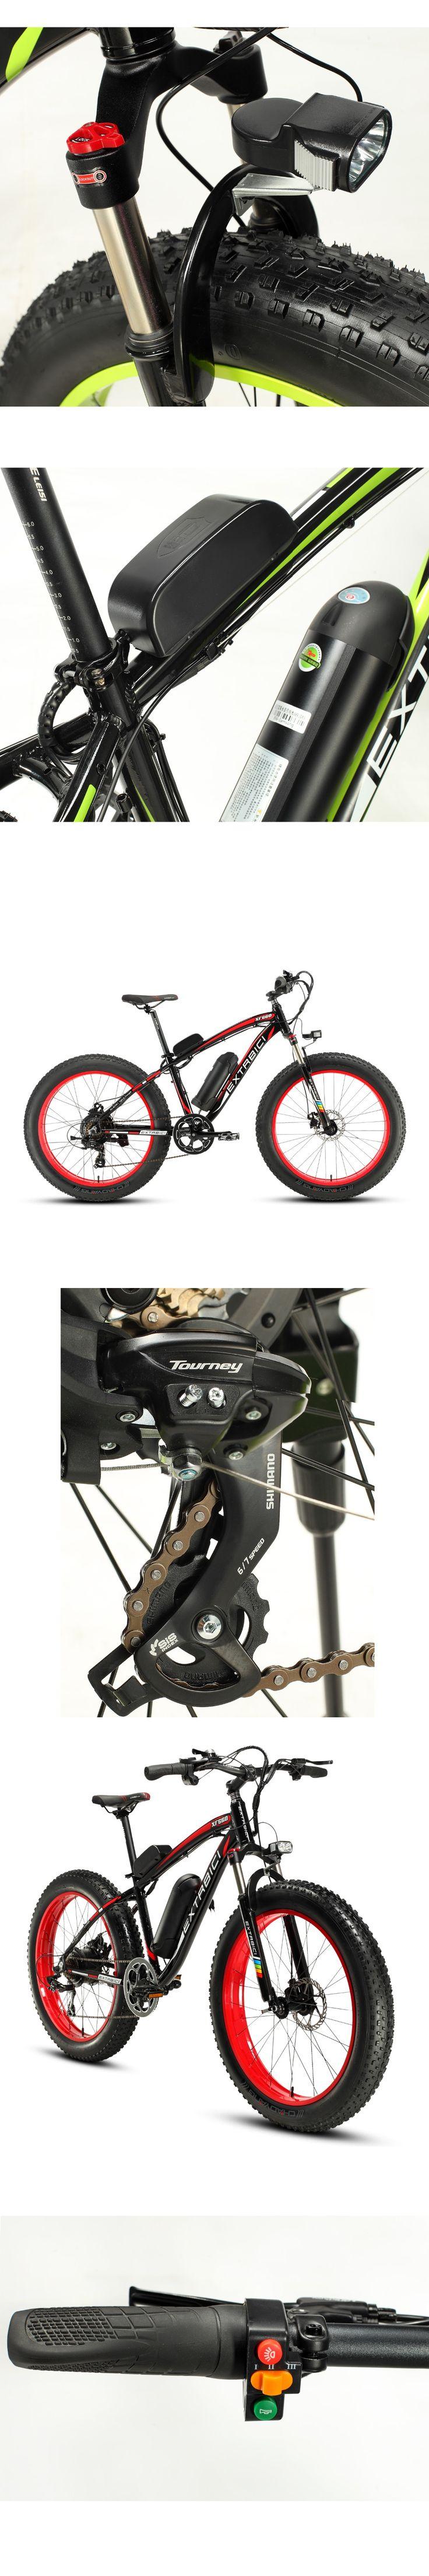 "Extrbici Man XF660 48V 500Watt Li-battery Electric Bike Mountain Snow Beach 7 Speeds 26"" 4.0 Fat Tire ebike Hydraulic Disc Brake"